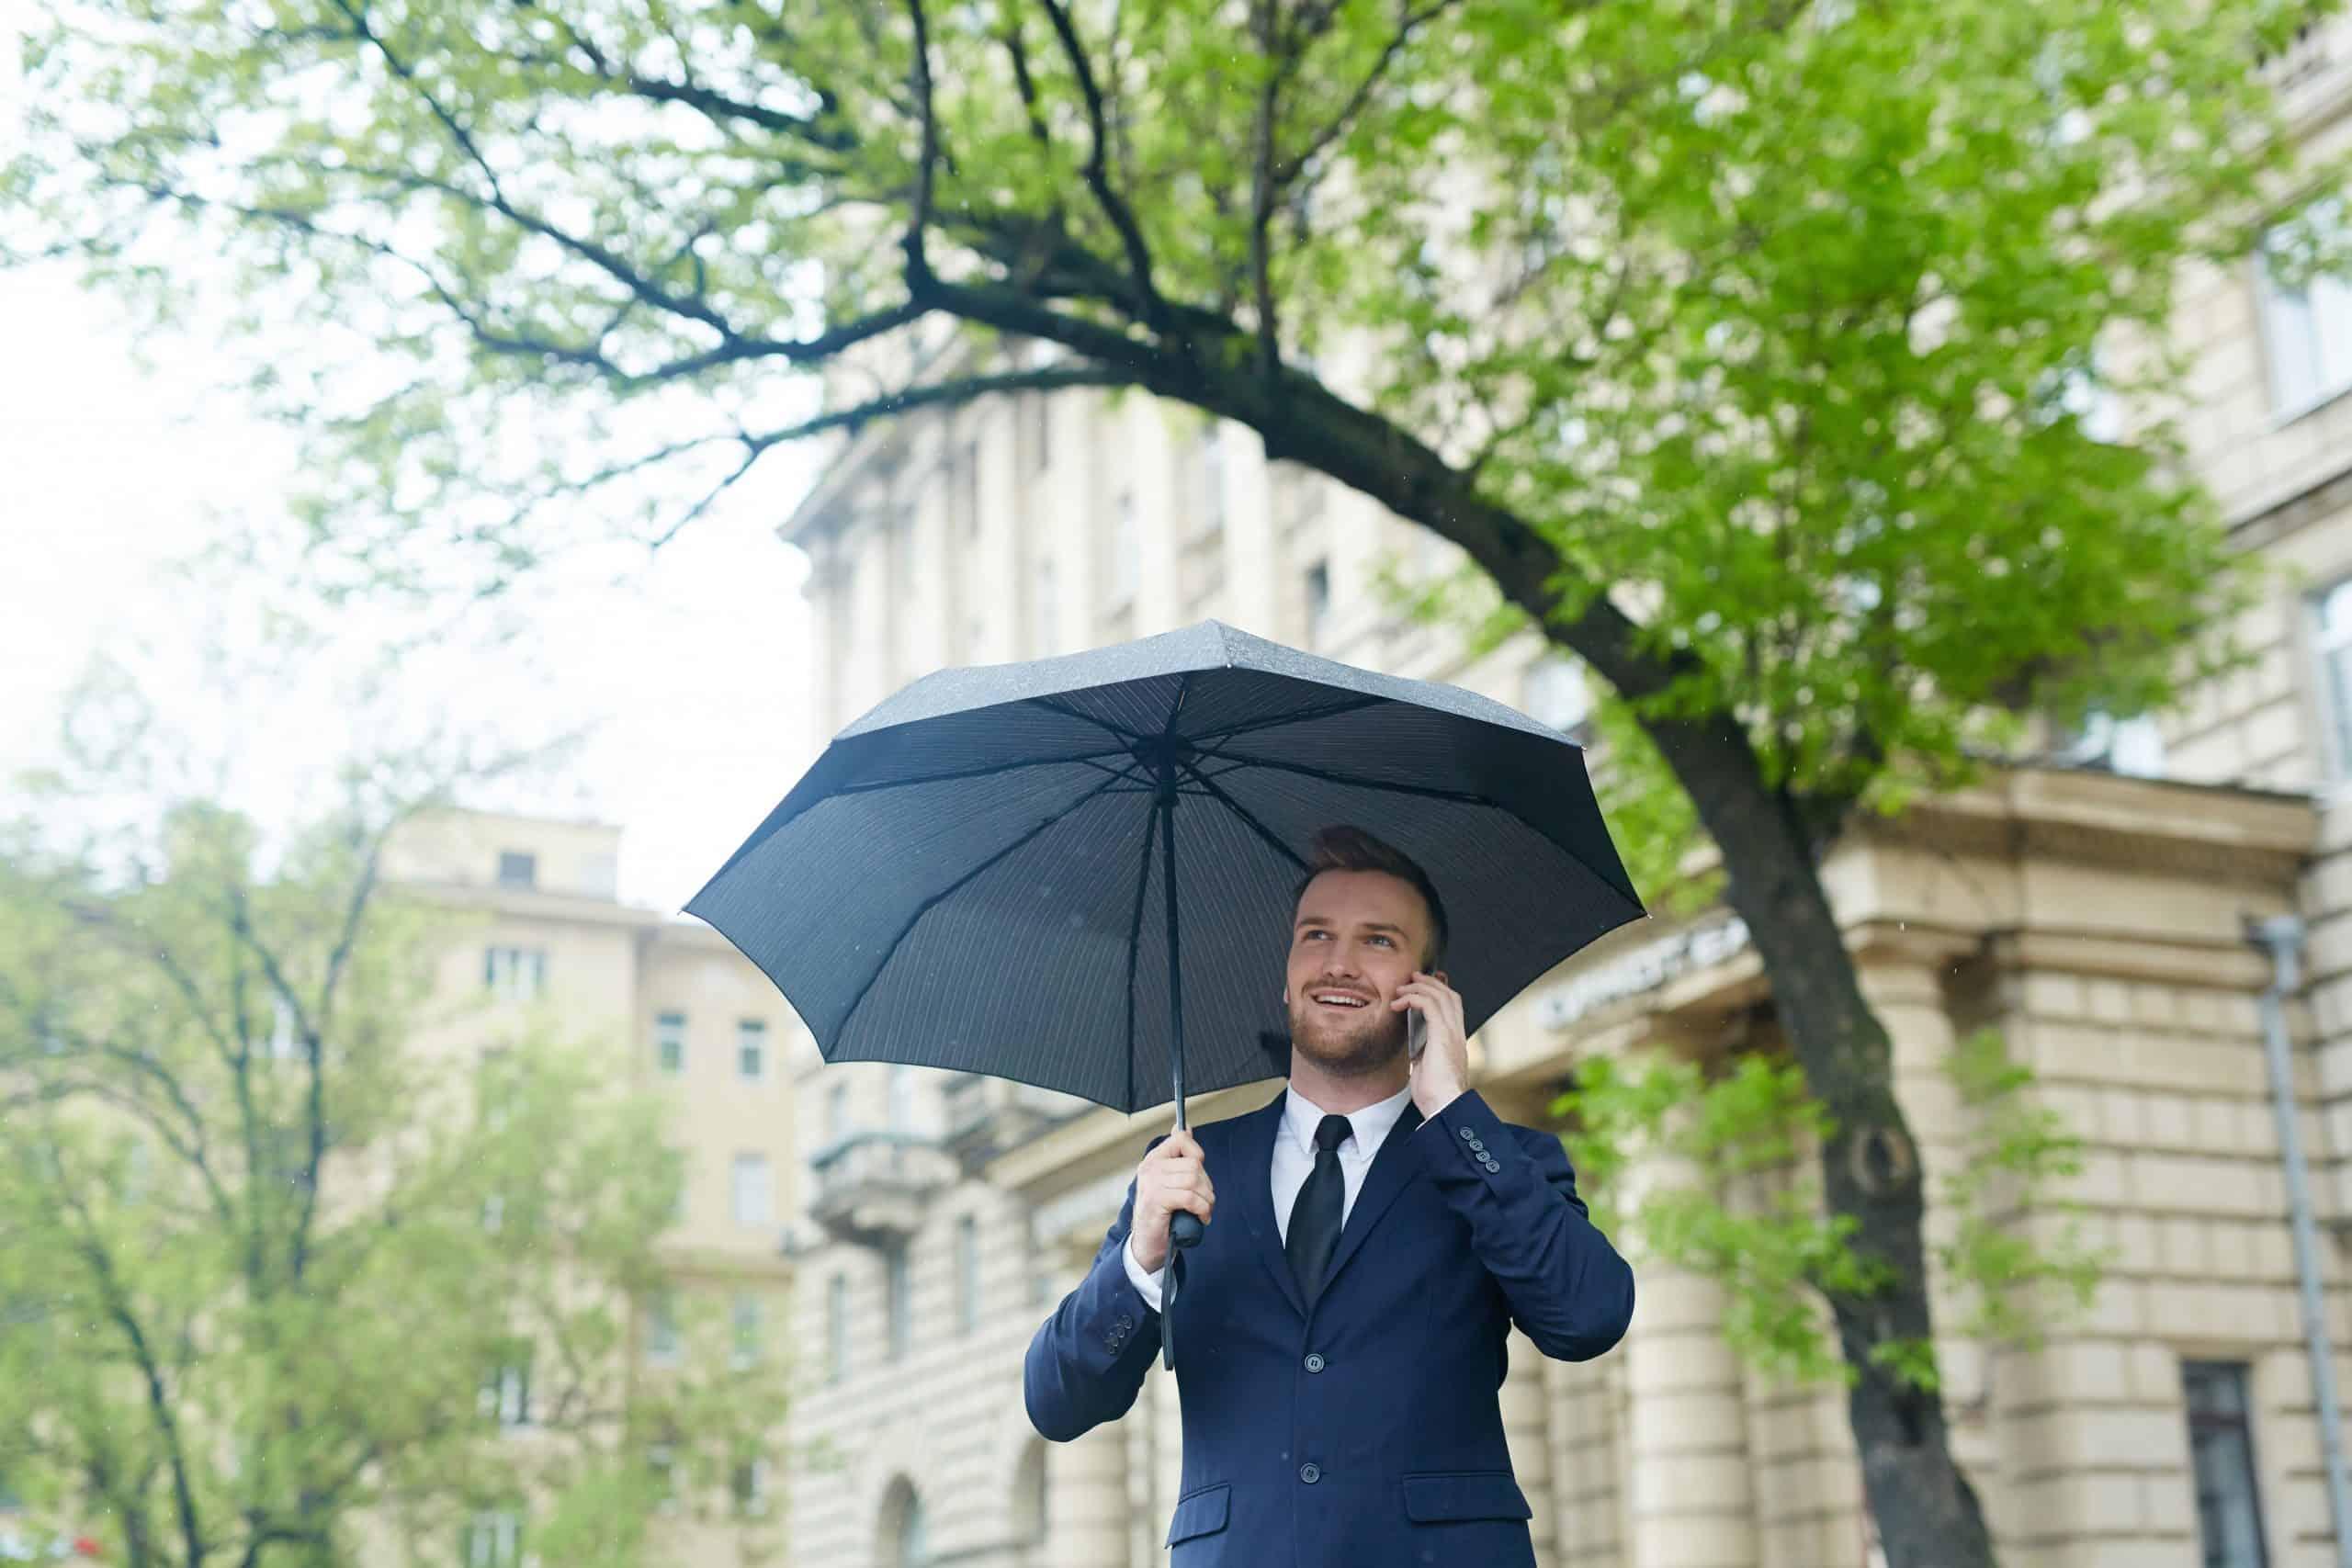 umbrella contractor